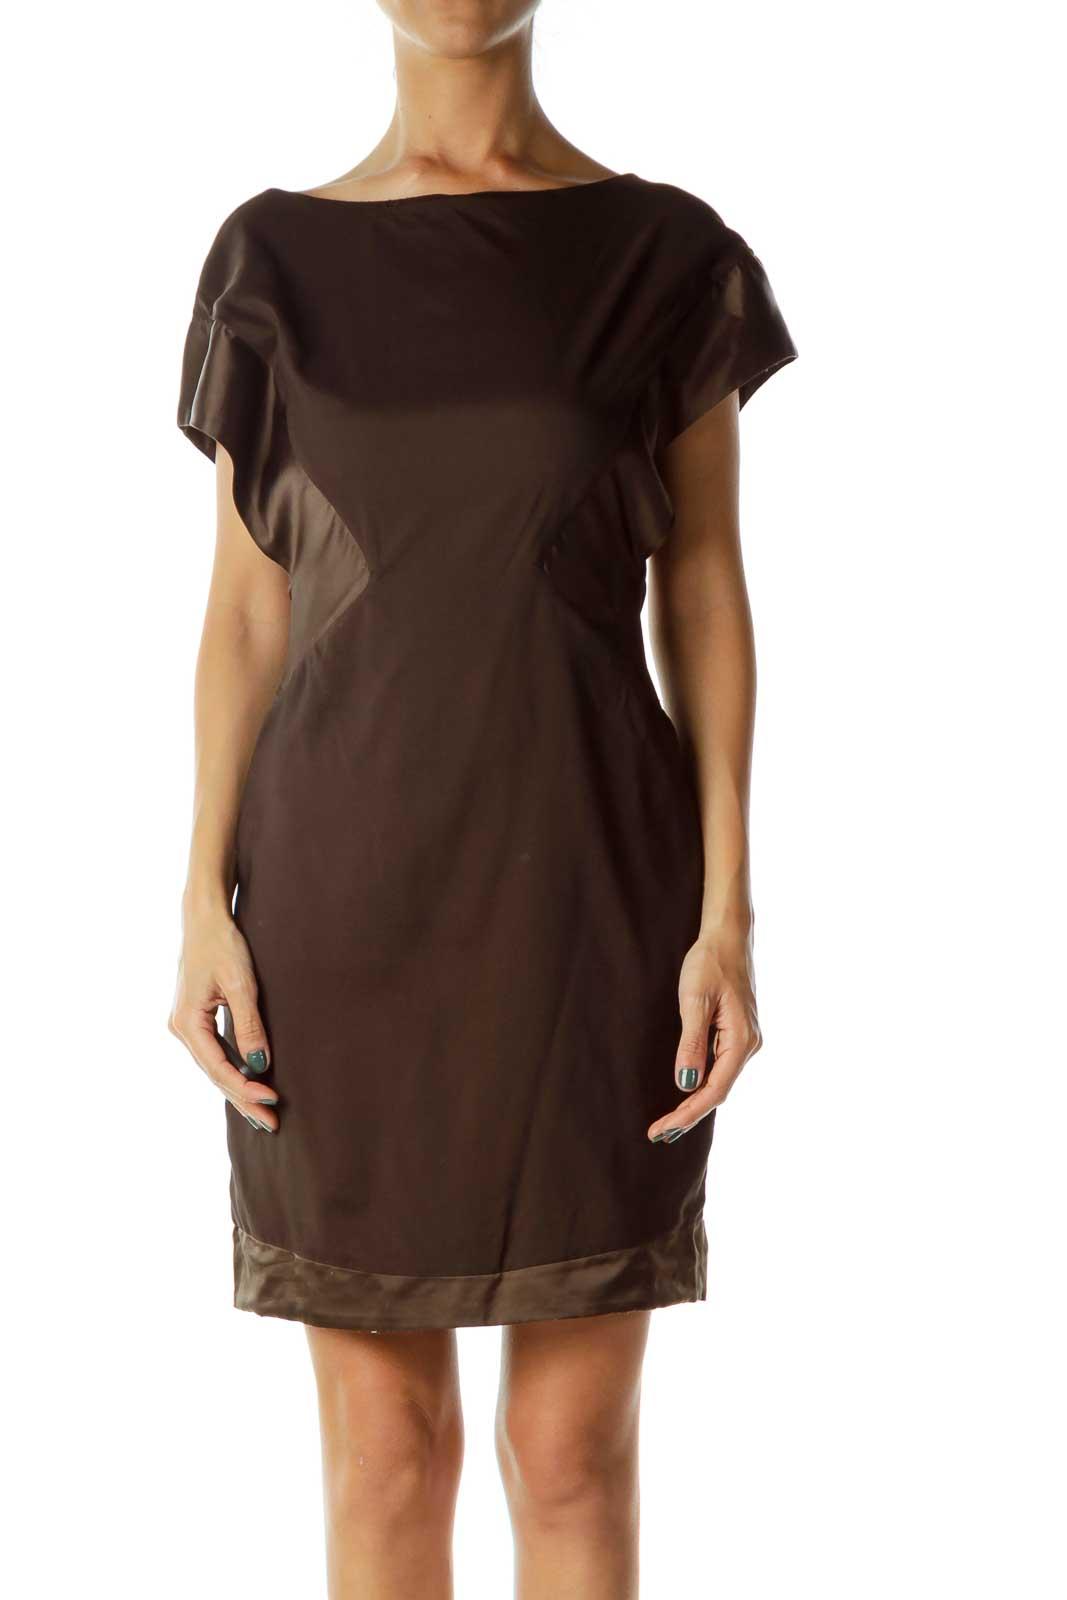 Brown Satin Detail Dress Front